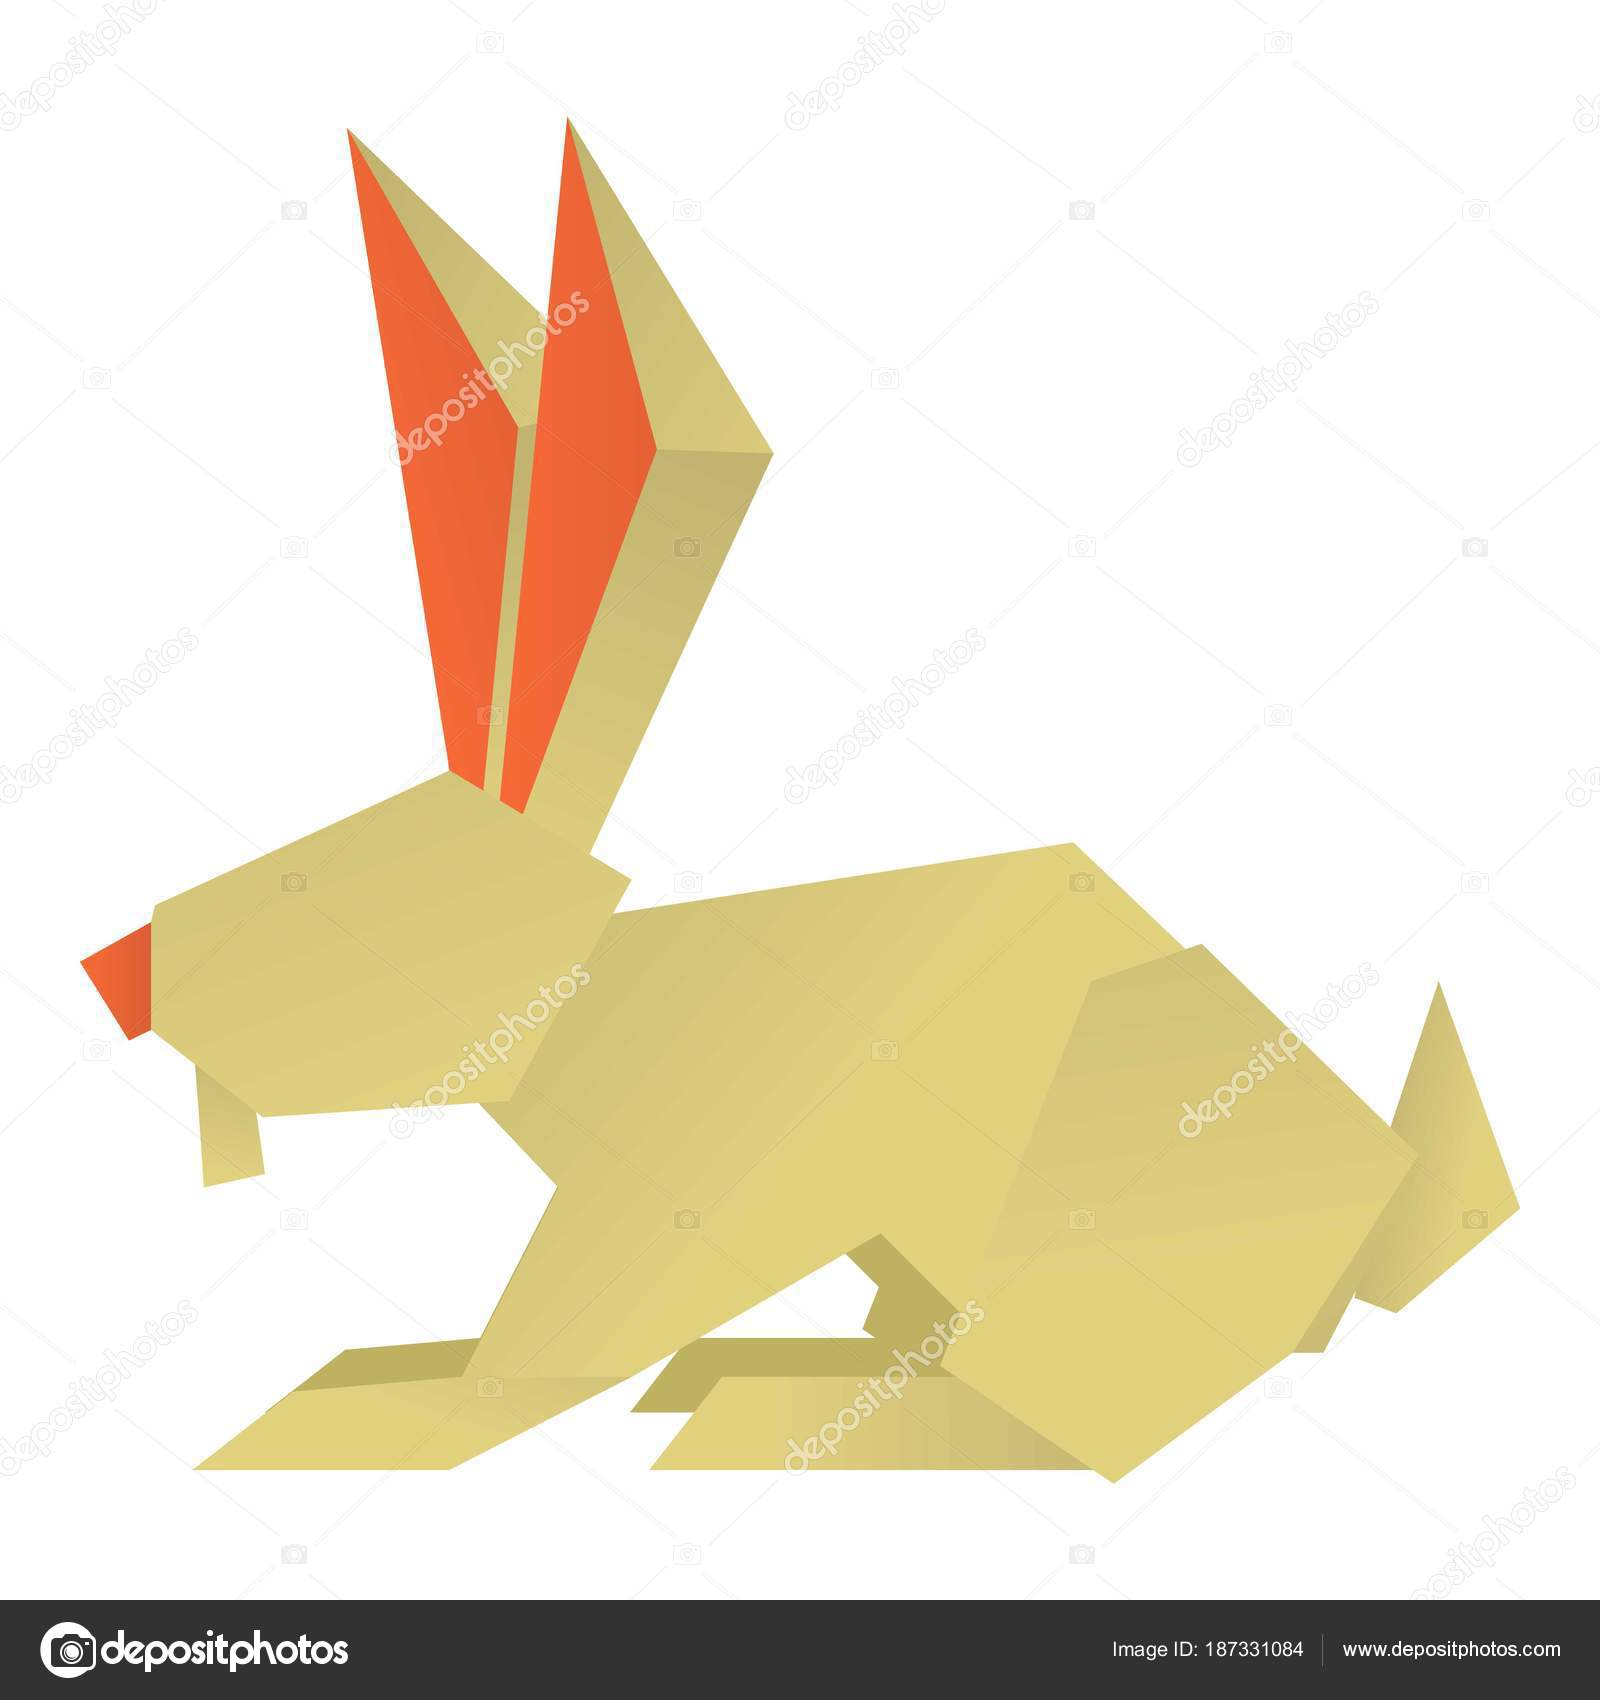 Origami Rabbit Icon Cartoon Style Stock Vector C Ylivdesign